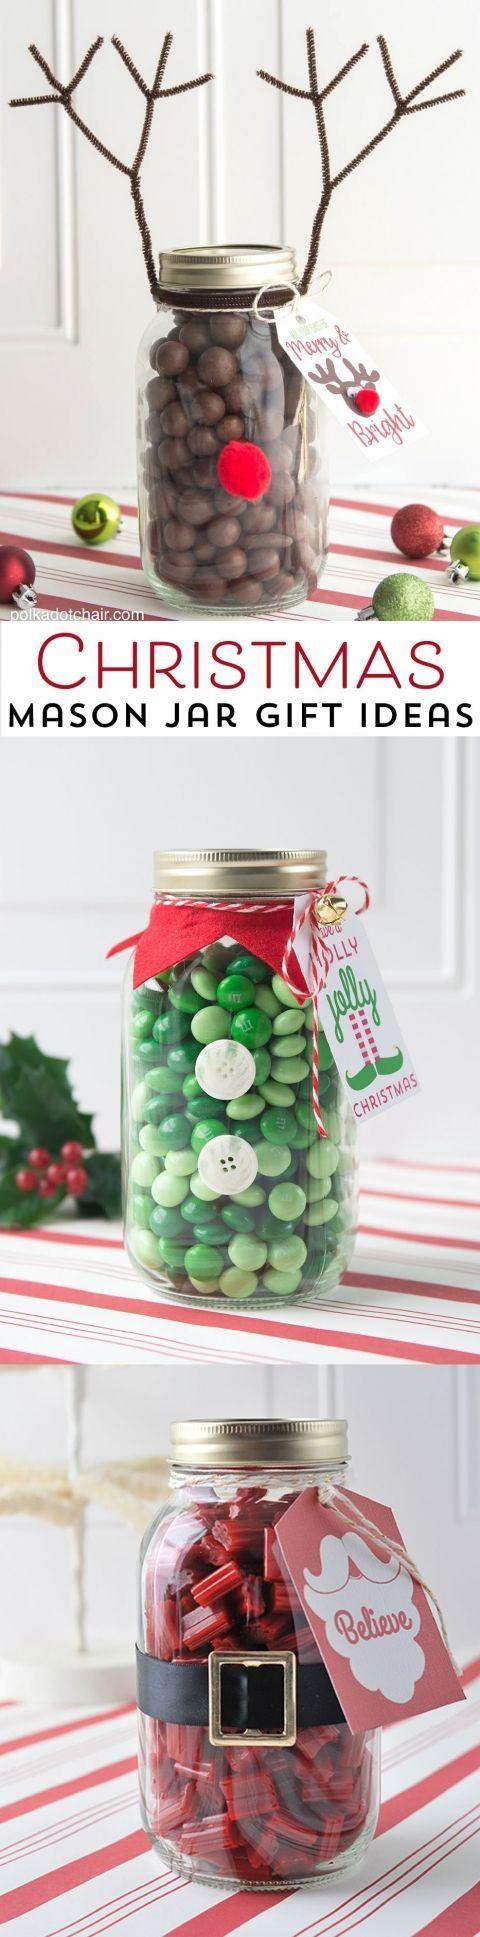 Teacher christmas gift ideas to make